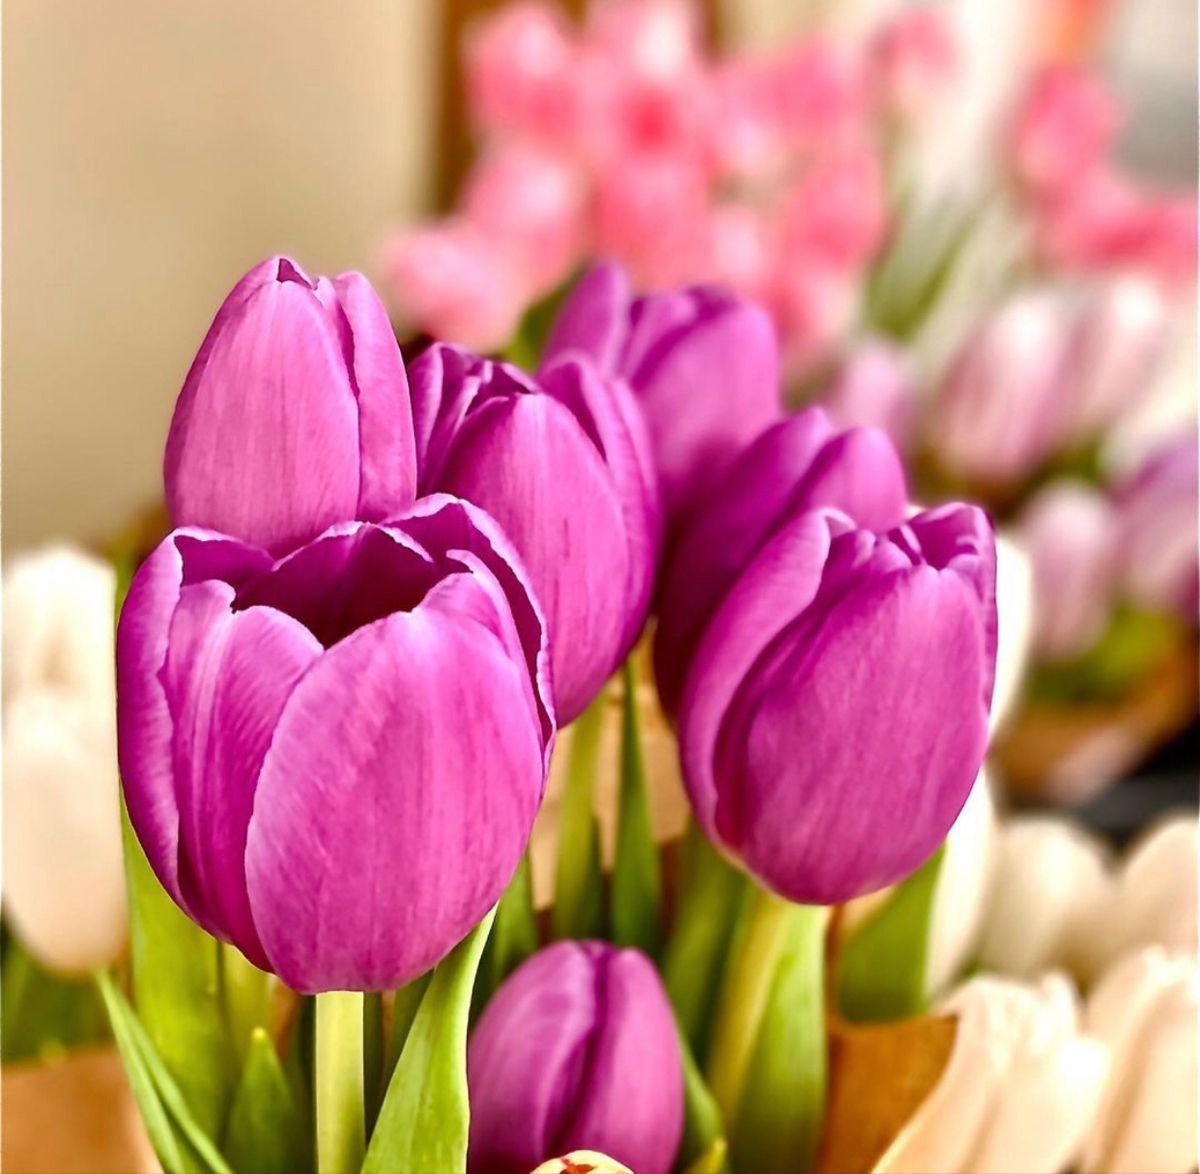 Tulip Flower In 2020 Flowers Tulips Flowers Wholesale Flowers